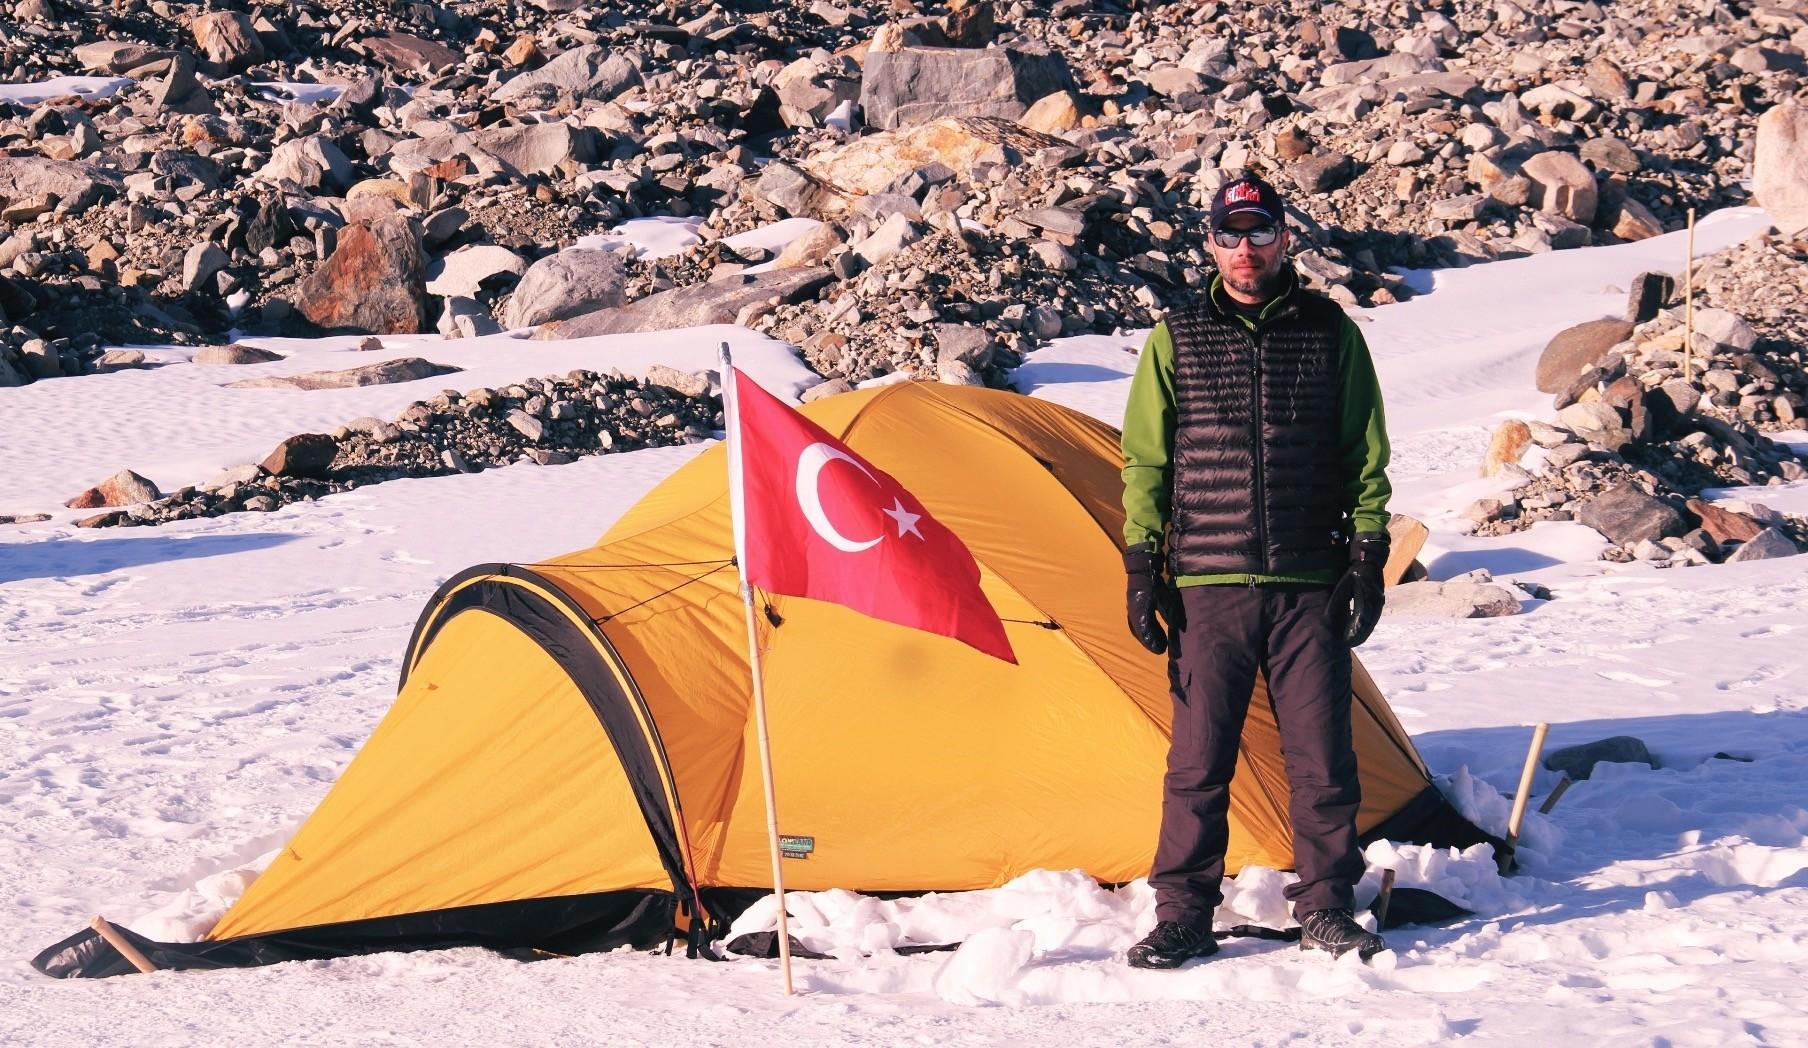 Turkish researcher Mehmet Yeu015filtau015f conducted his studies at Belgiumu2019s base on Antarctica.